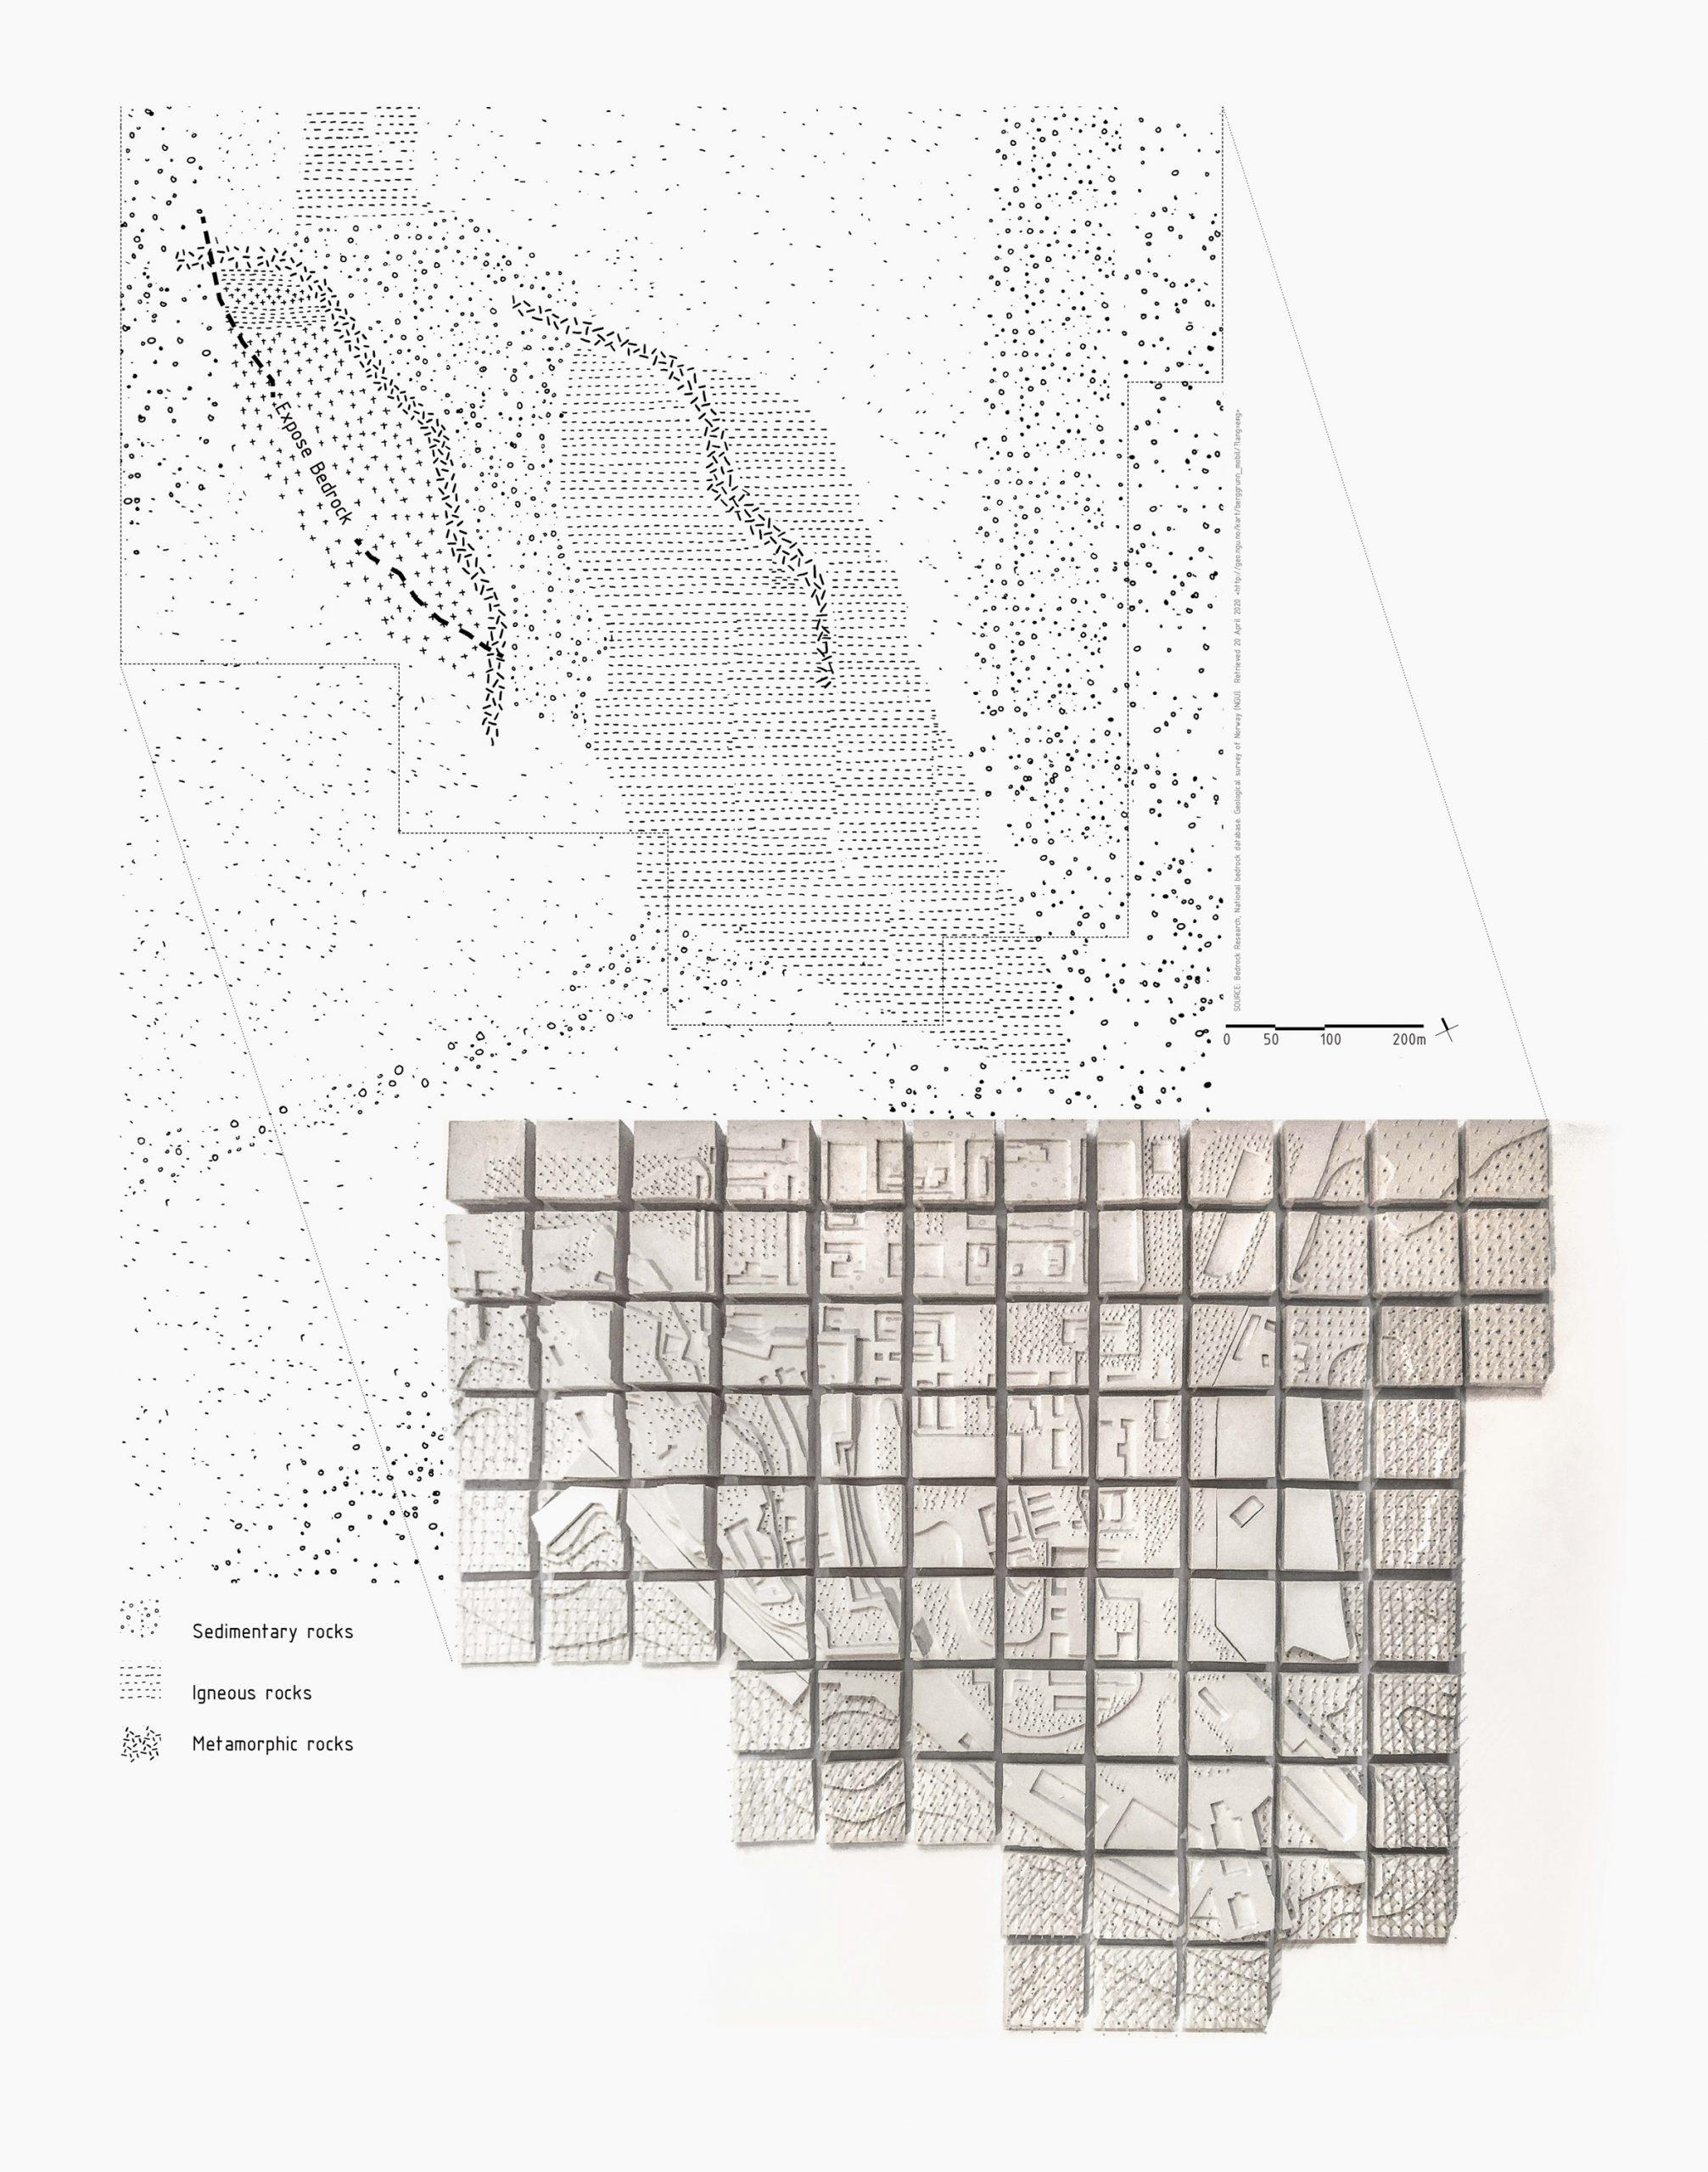 Reimagining Urban Landmarks - The Akersnes Peninsula by Yanqin Pan